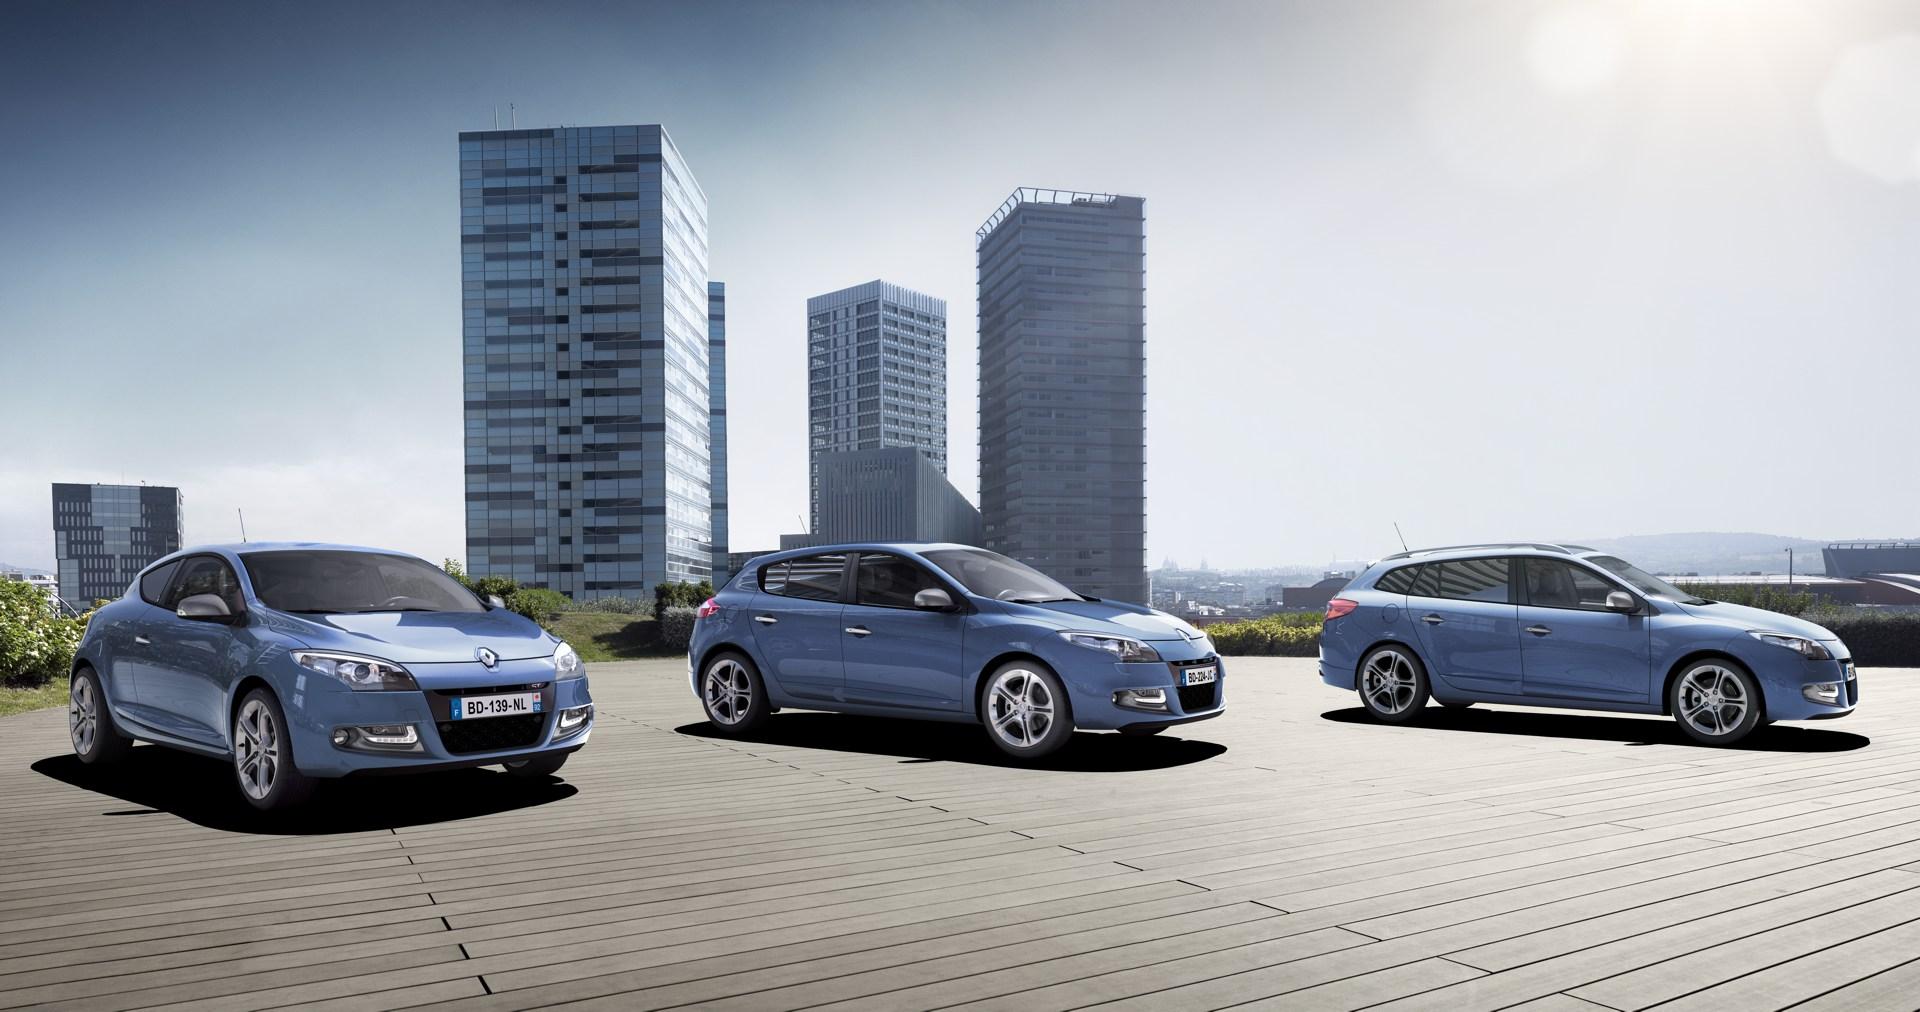 Llega el Renault Megane 2012